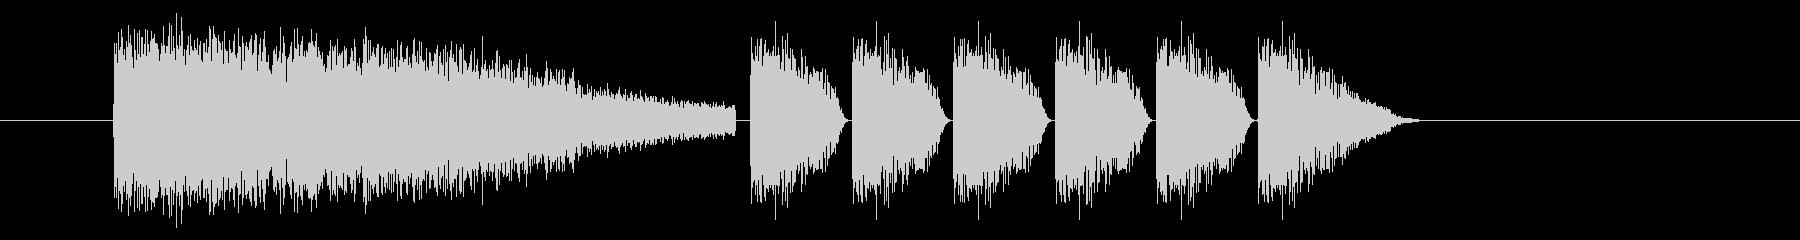 SNES-RPG04-09(魔法 氷2)の未再生の波形